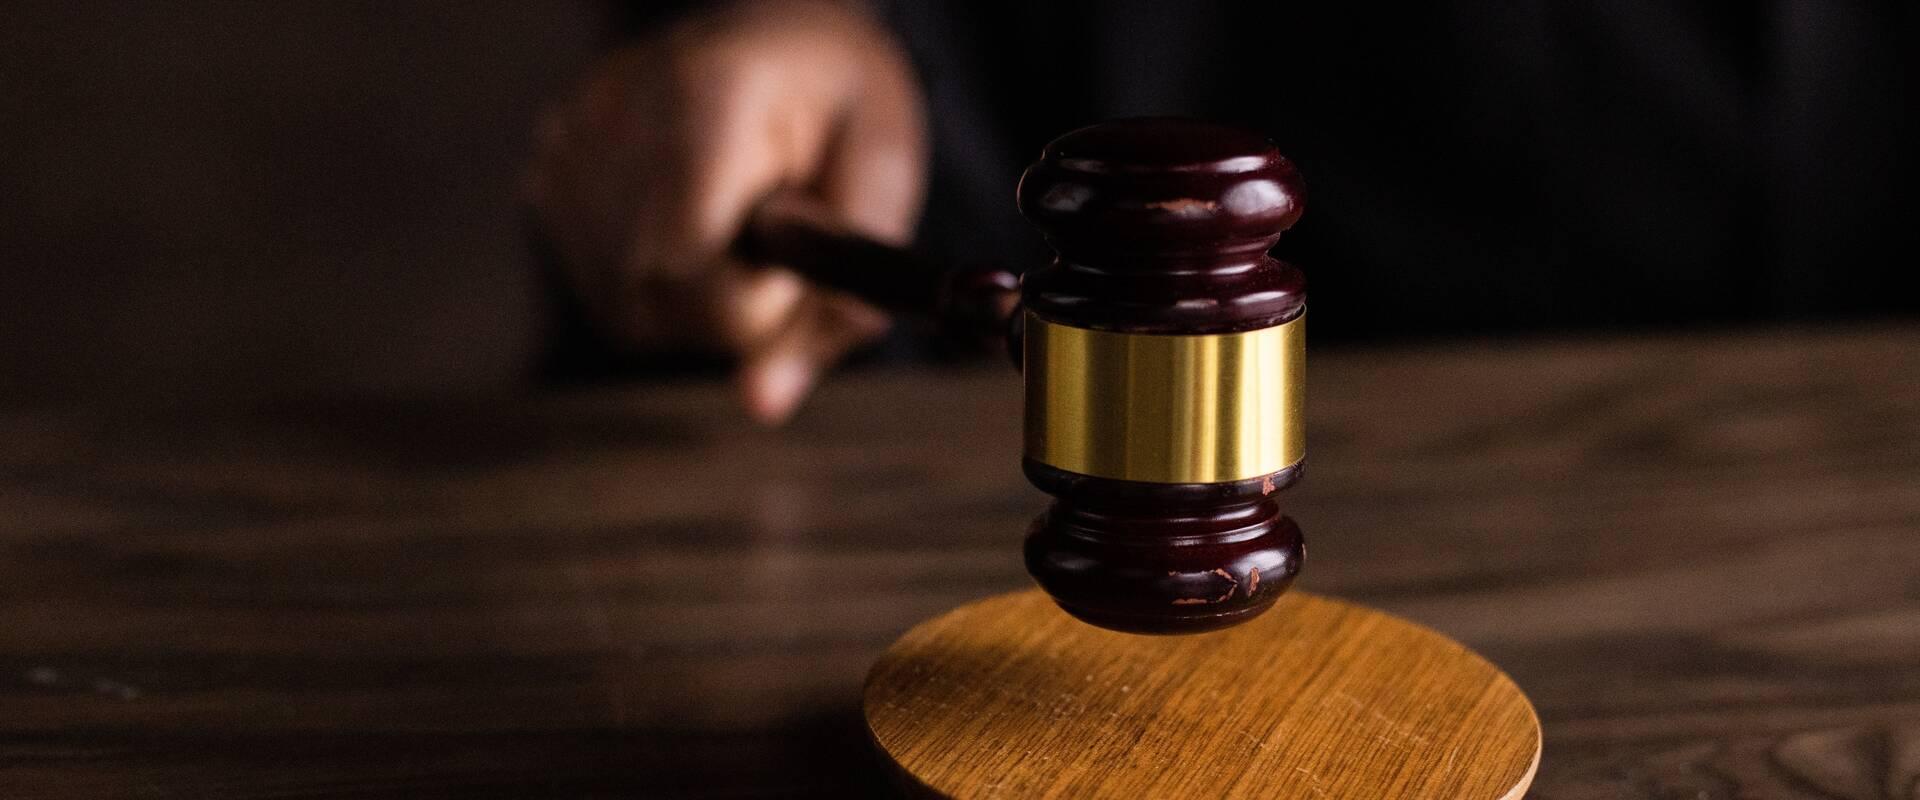 Paul S. Ernenwein, Esq. Secures Unanimous Jury Verdict